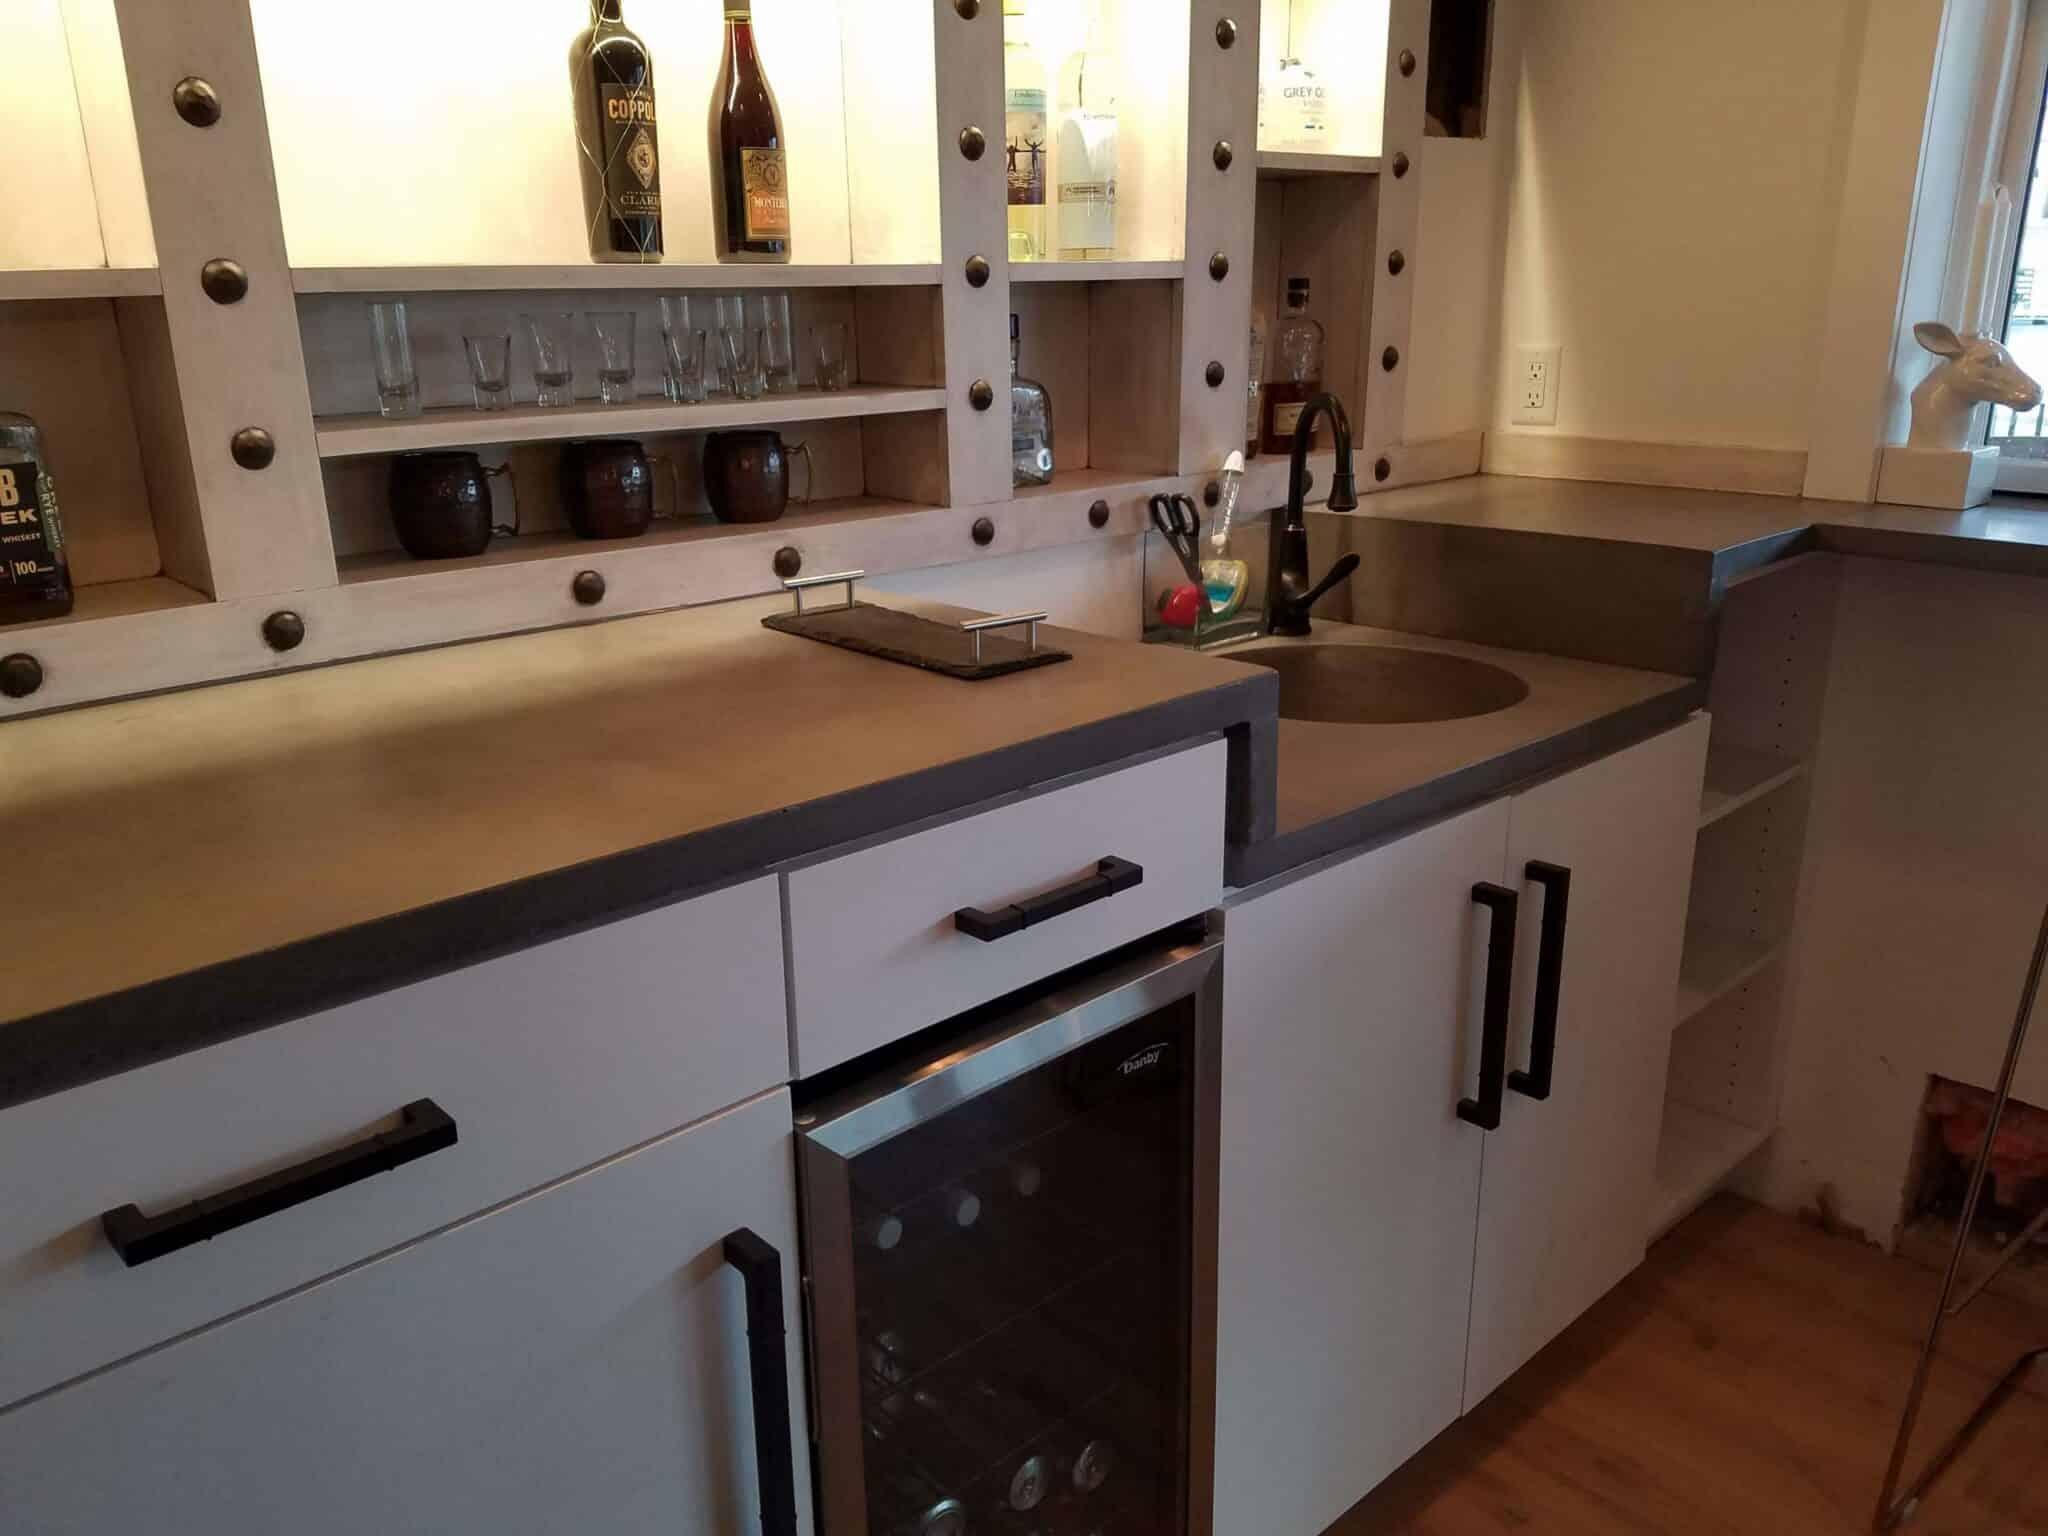 Battleship gray, kitchen counter top